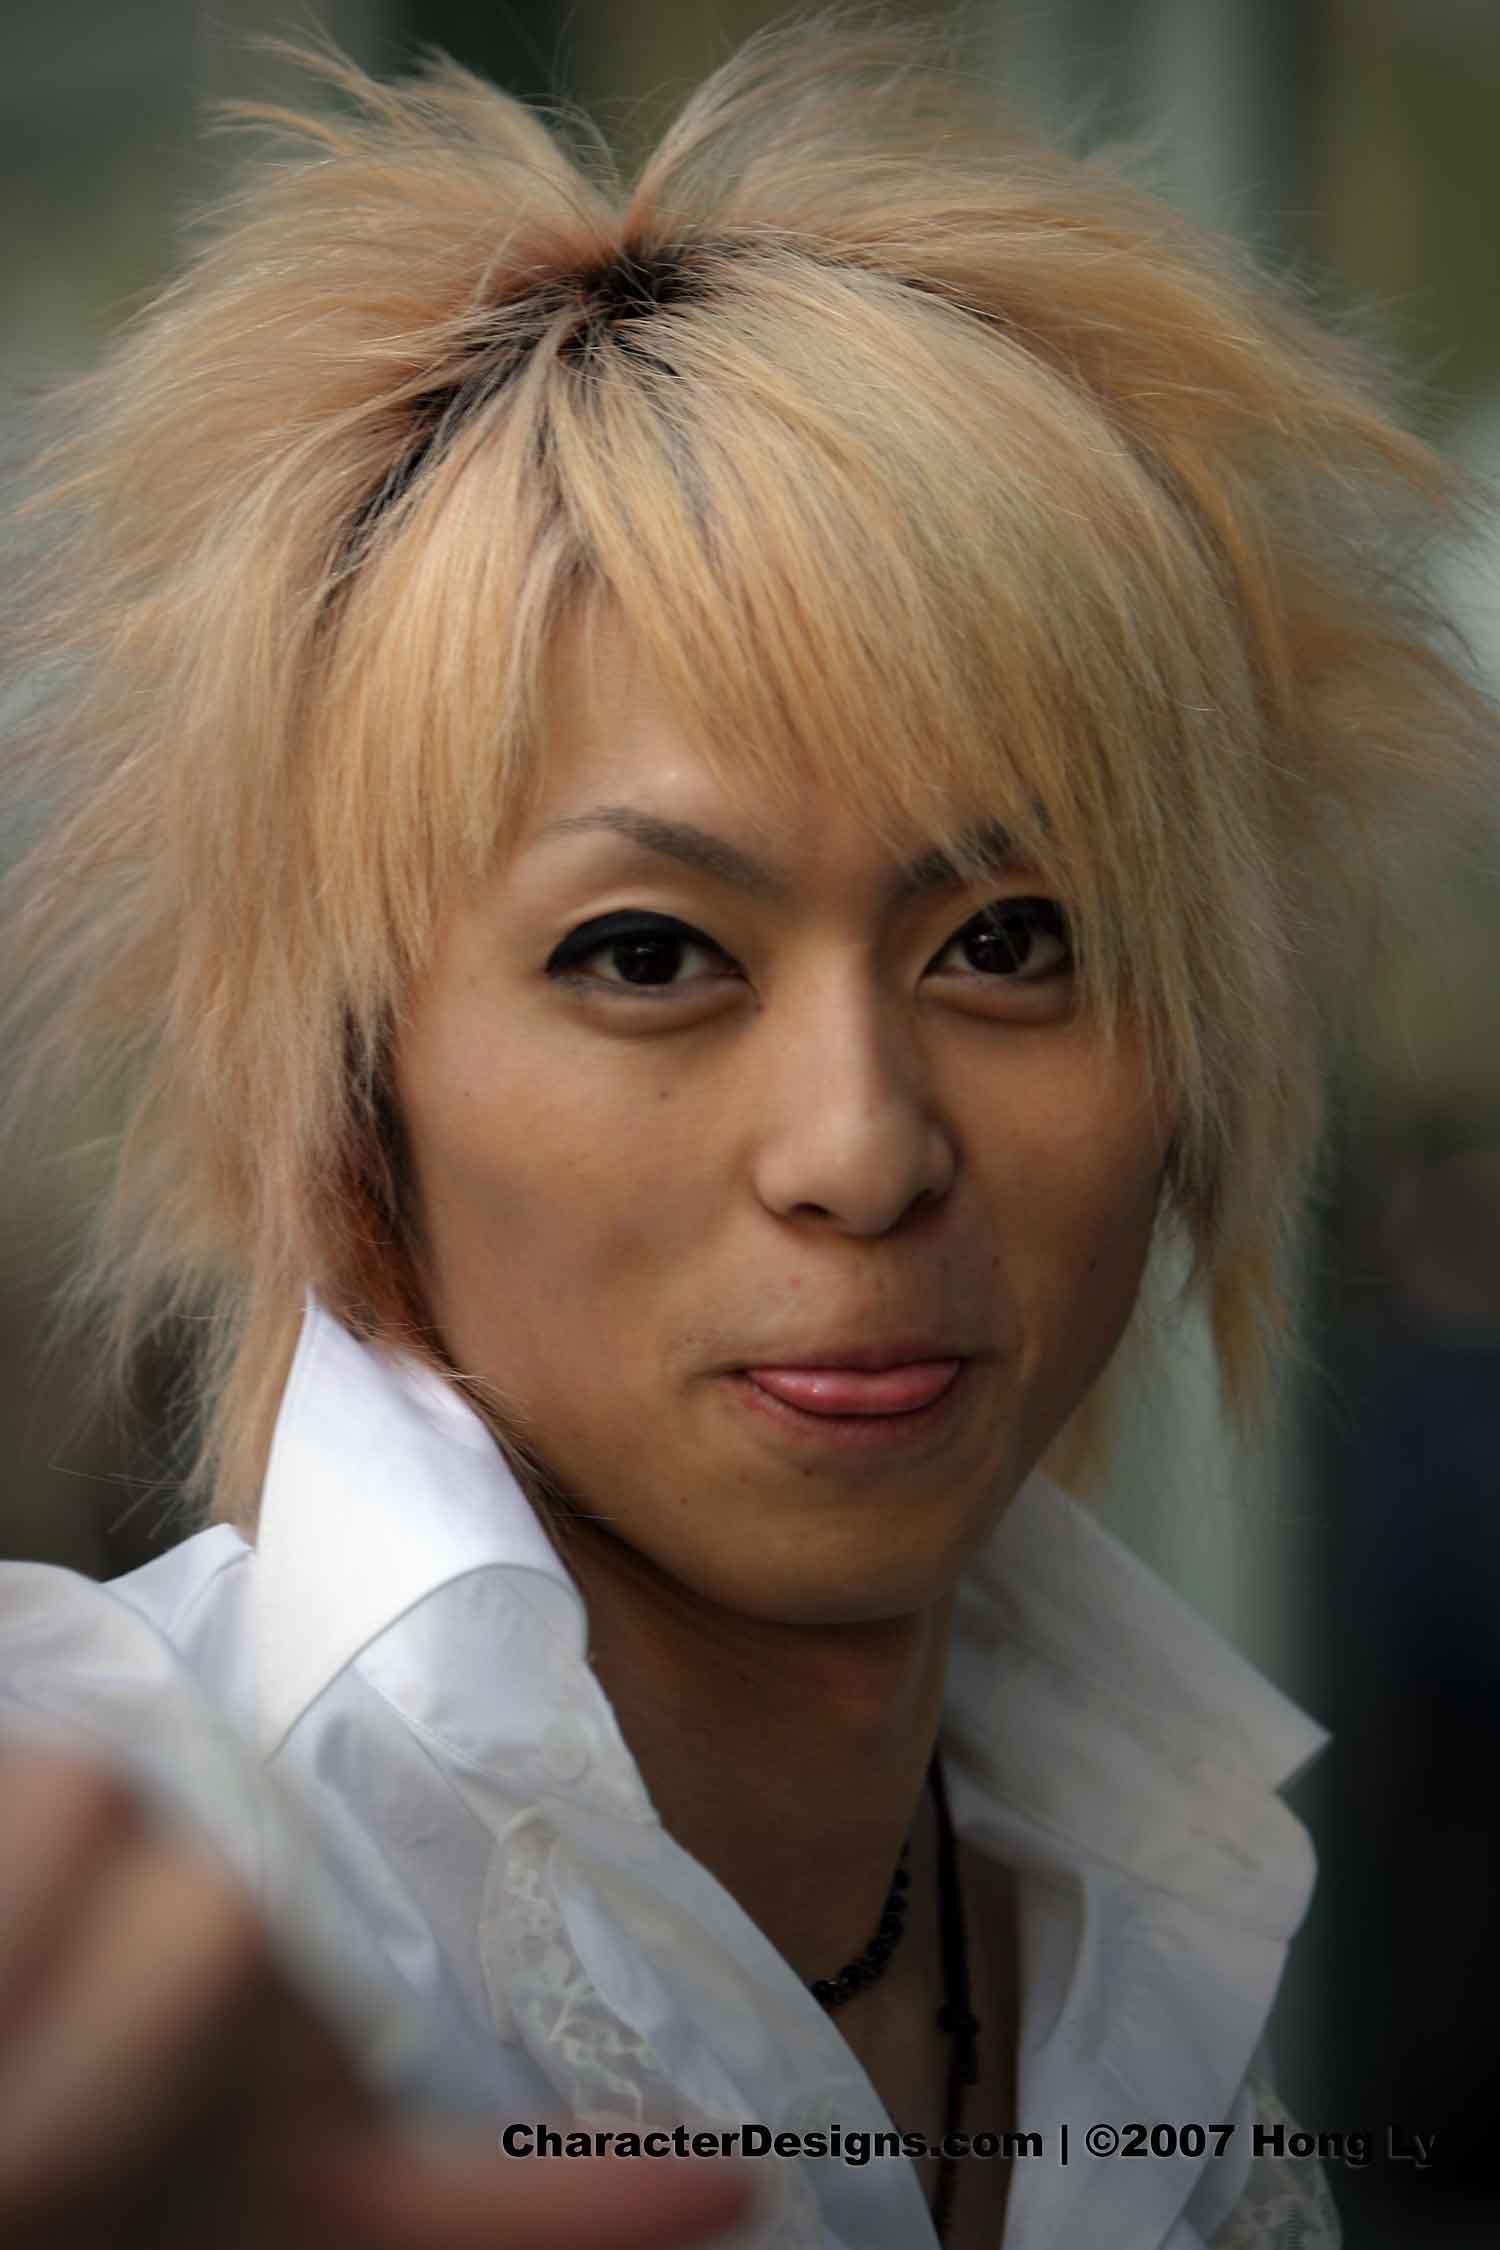 Faces_of_AX_2006_173.jpg